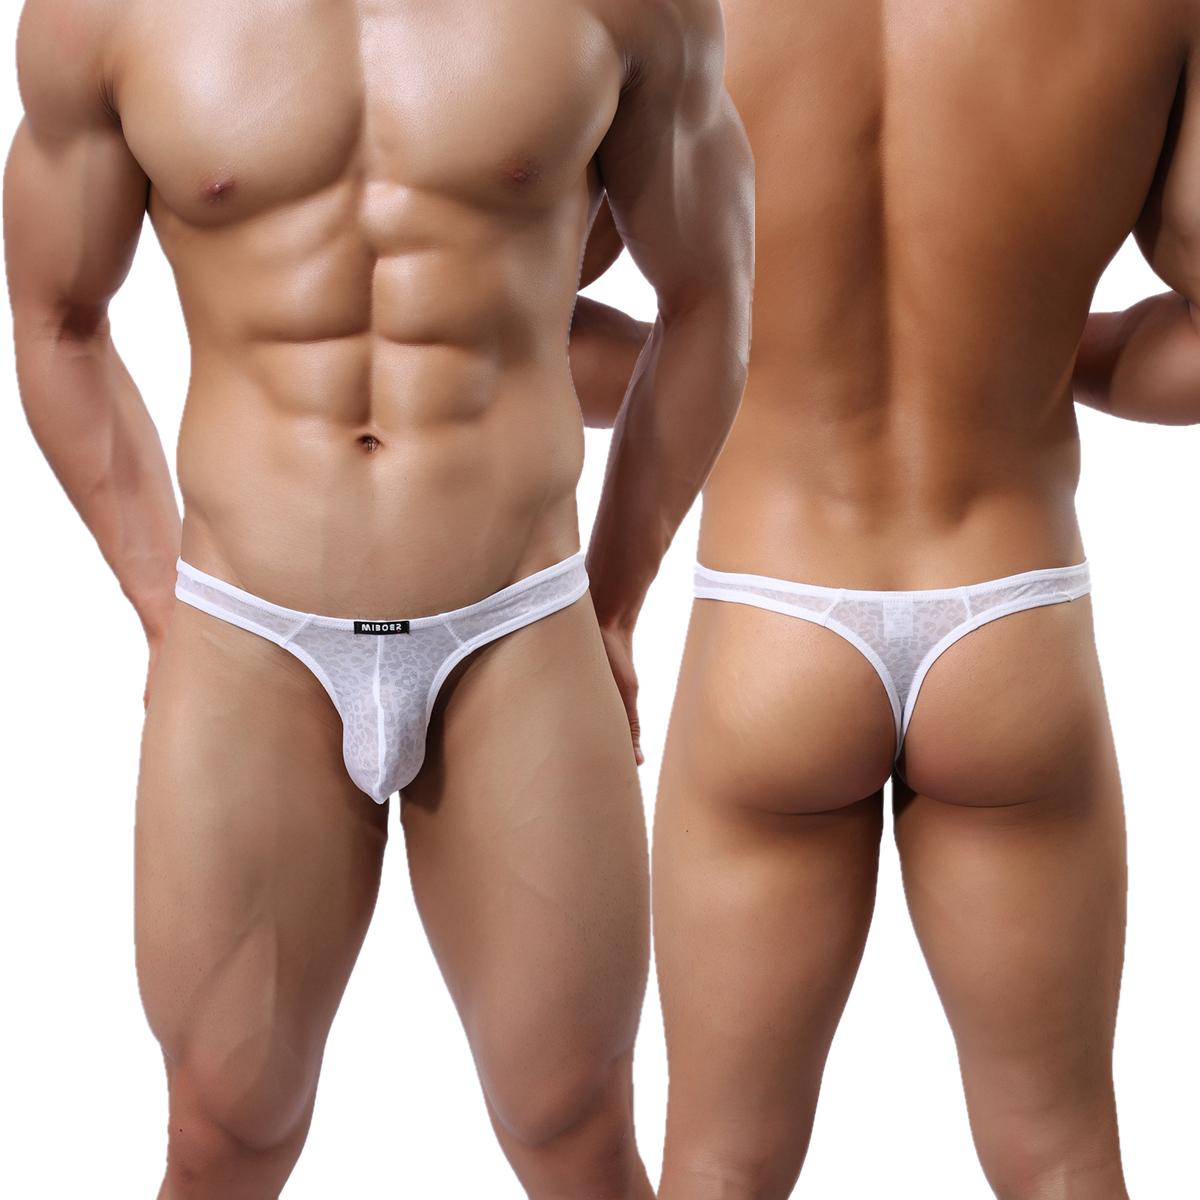 Men's G-Strings Thong See-through Sexy Lace Mesh T-Back Underwear Jock  Strap | eBay